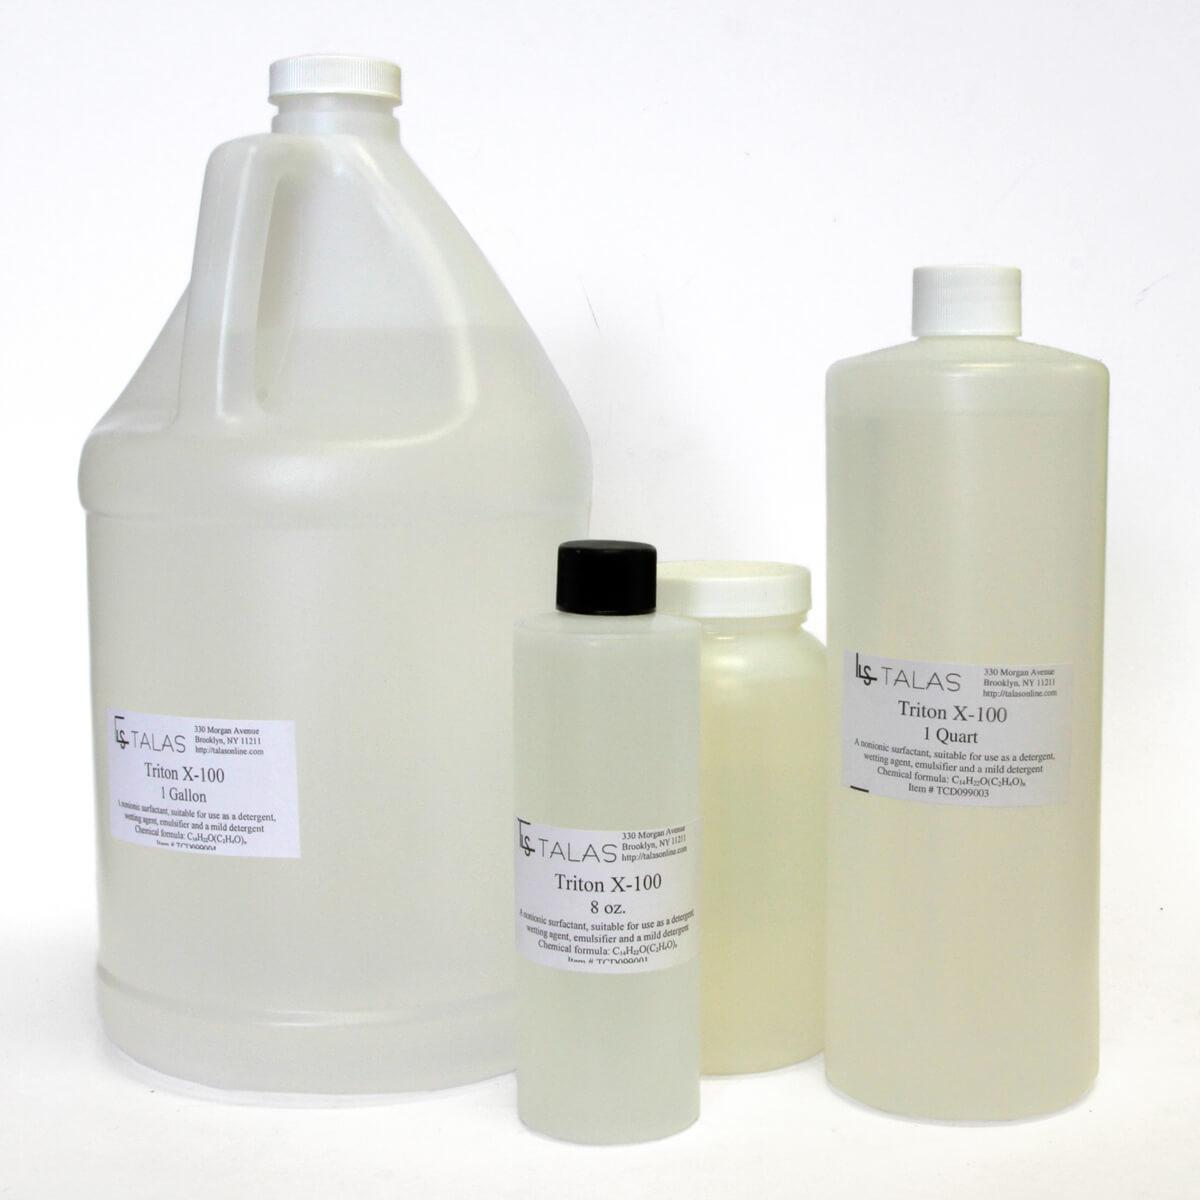 Triton X-100 Nonionic Surfactant Detergent | TALAS